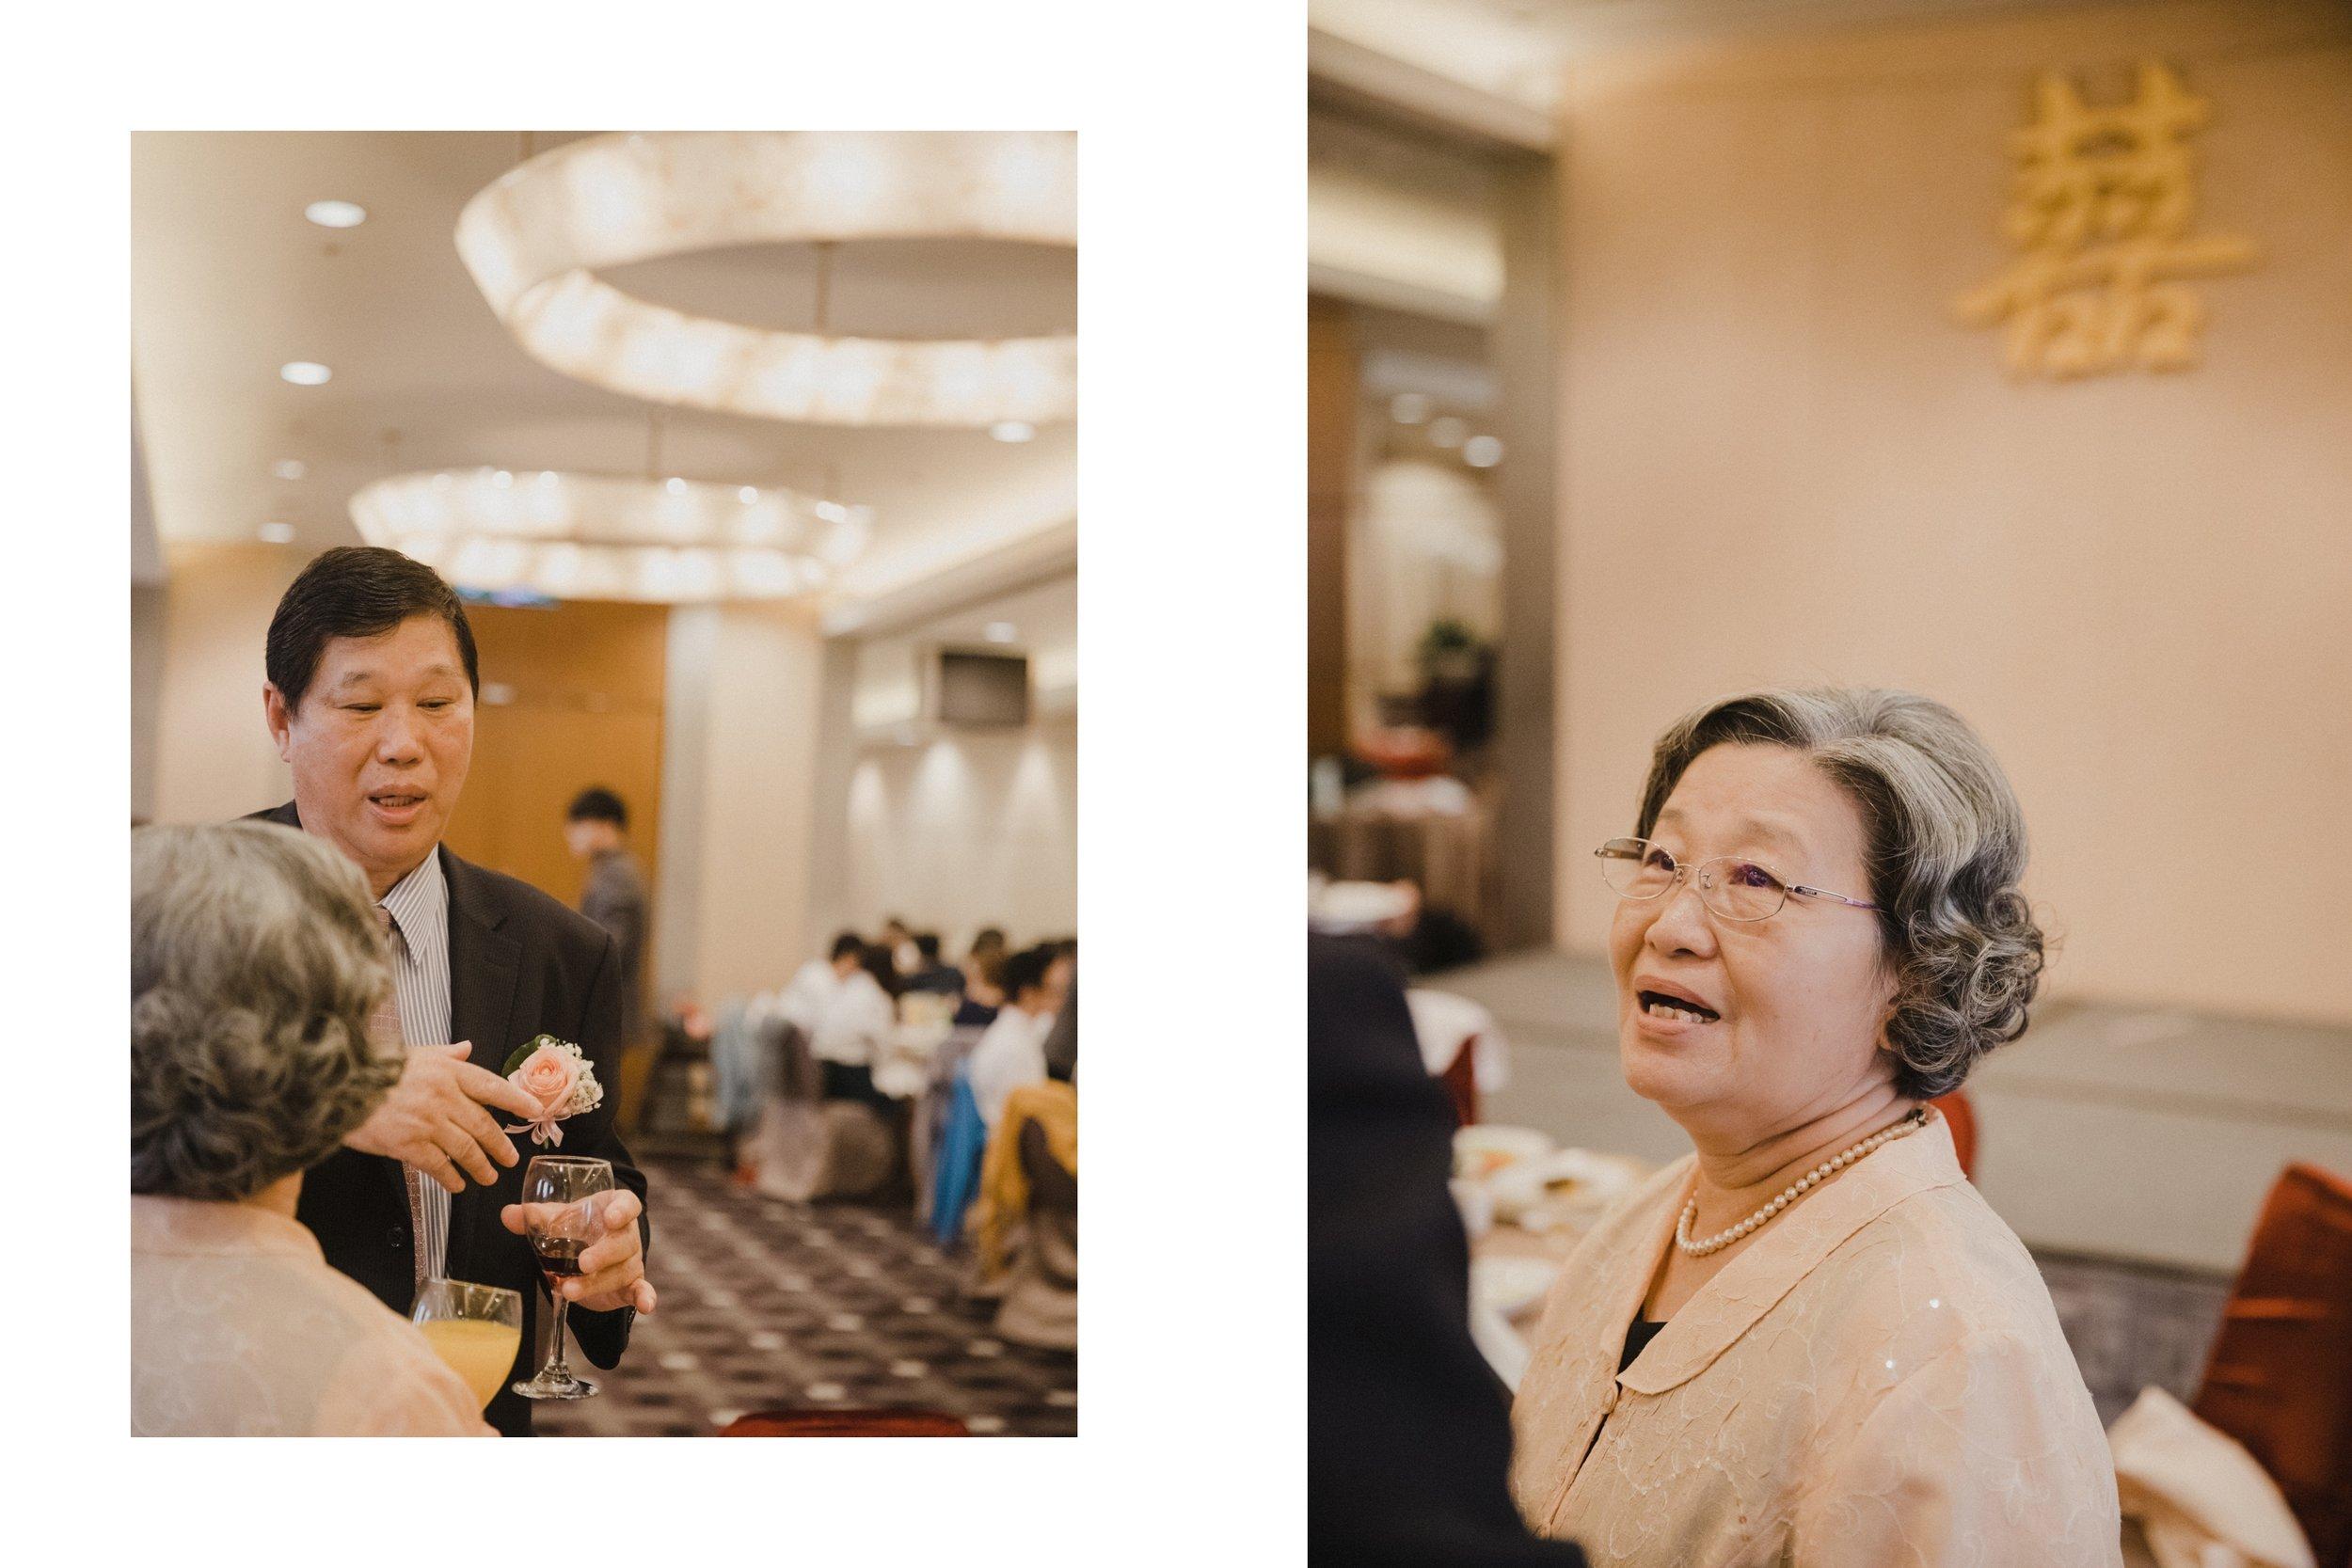 wedding-caridee-oscar-lunch-ambassador-hsinchu-結婚午宴-新竹國賓_138.jpg